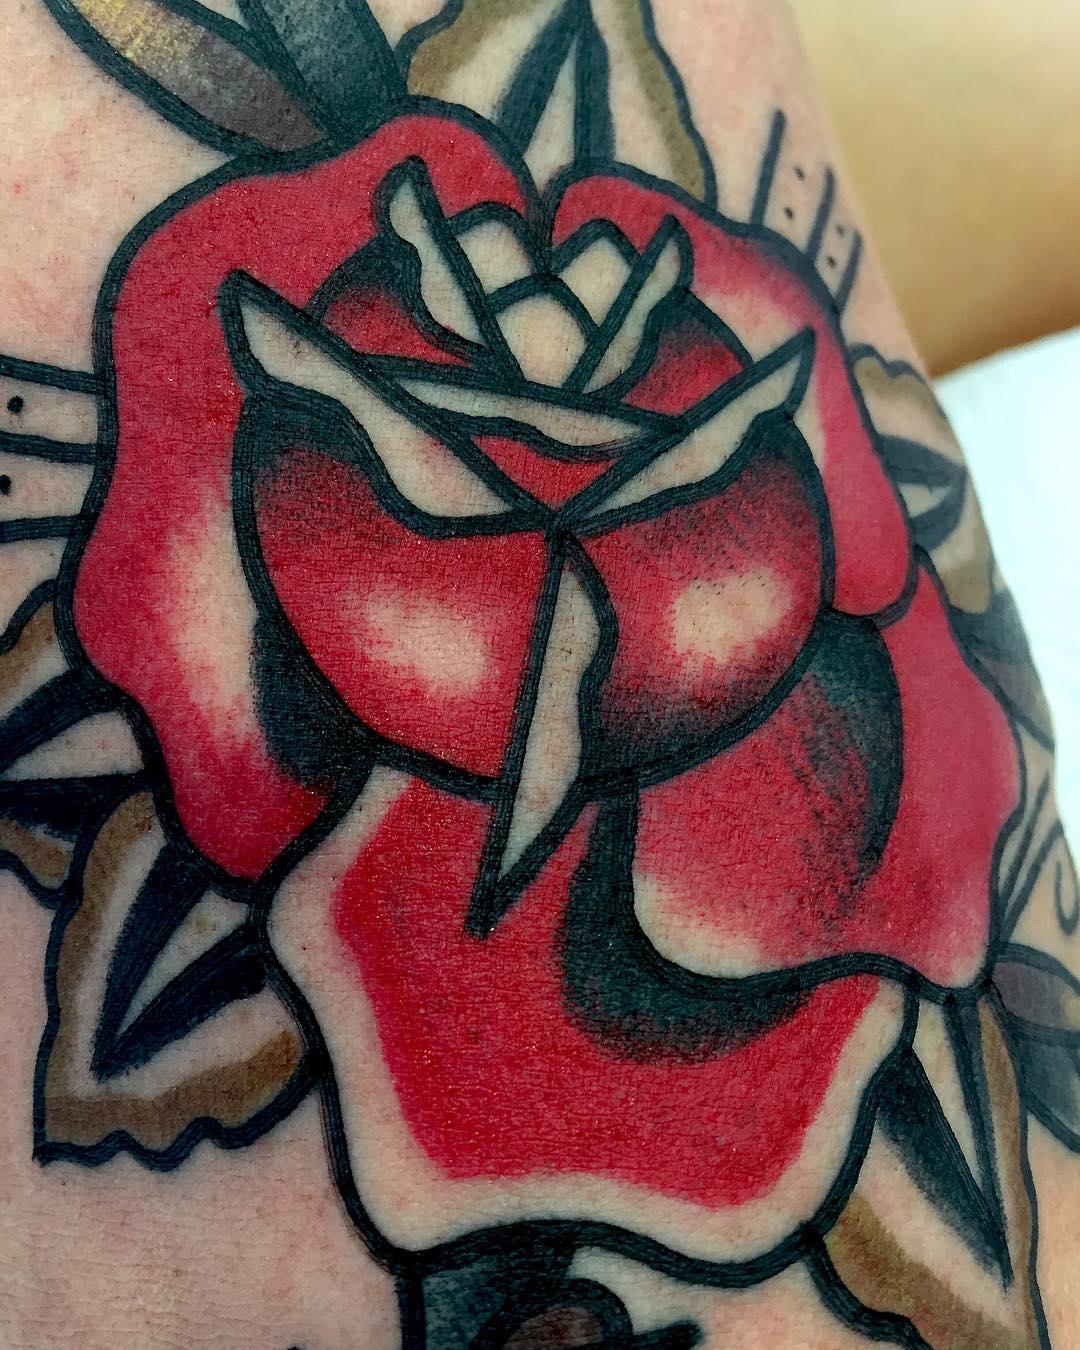 tattooart,art,artistic,old,oldschollshit,custommade,owl,tabasco,berlintattoo,barcelonatattoo,ibizatattoo,tabascotattooer,bestattooers,tradicionaltattooers,bestisbest,tatuajes,berlintattooers,ontheroad,classictattoo,tendencia,creativity,bobinas,tradicional,studyofberlin,tattooart,art,artistic,old,oldschollshit,custommade,owl,tabasco,berlintattoo,barcelonatattoo,ibizatattoo,boldtattooart